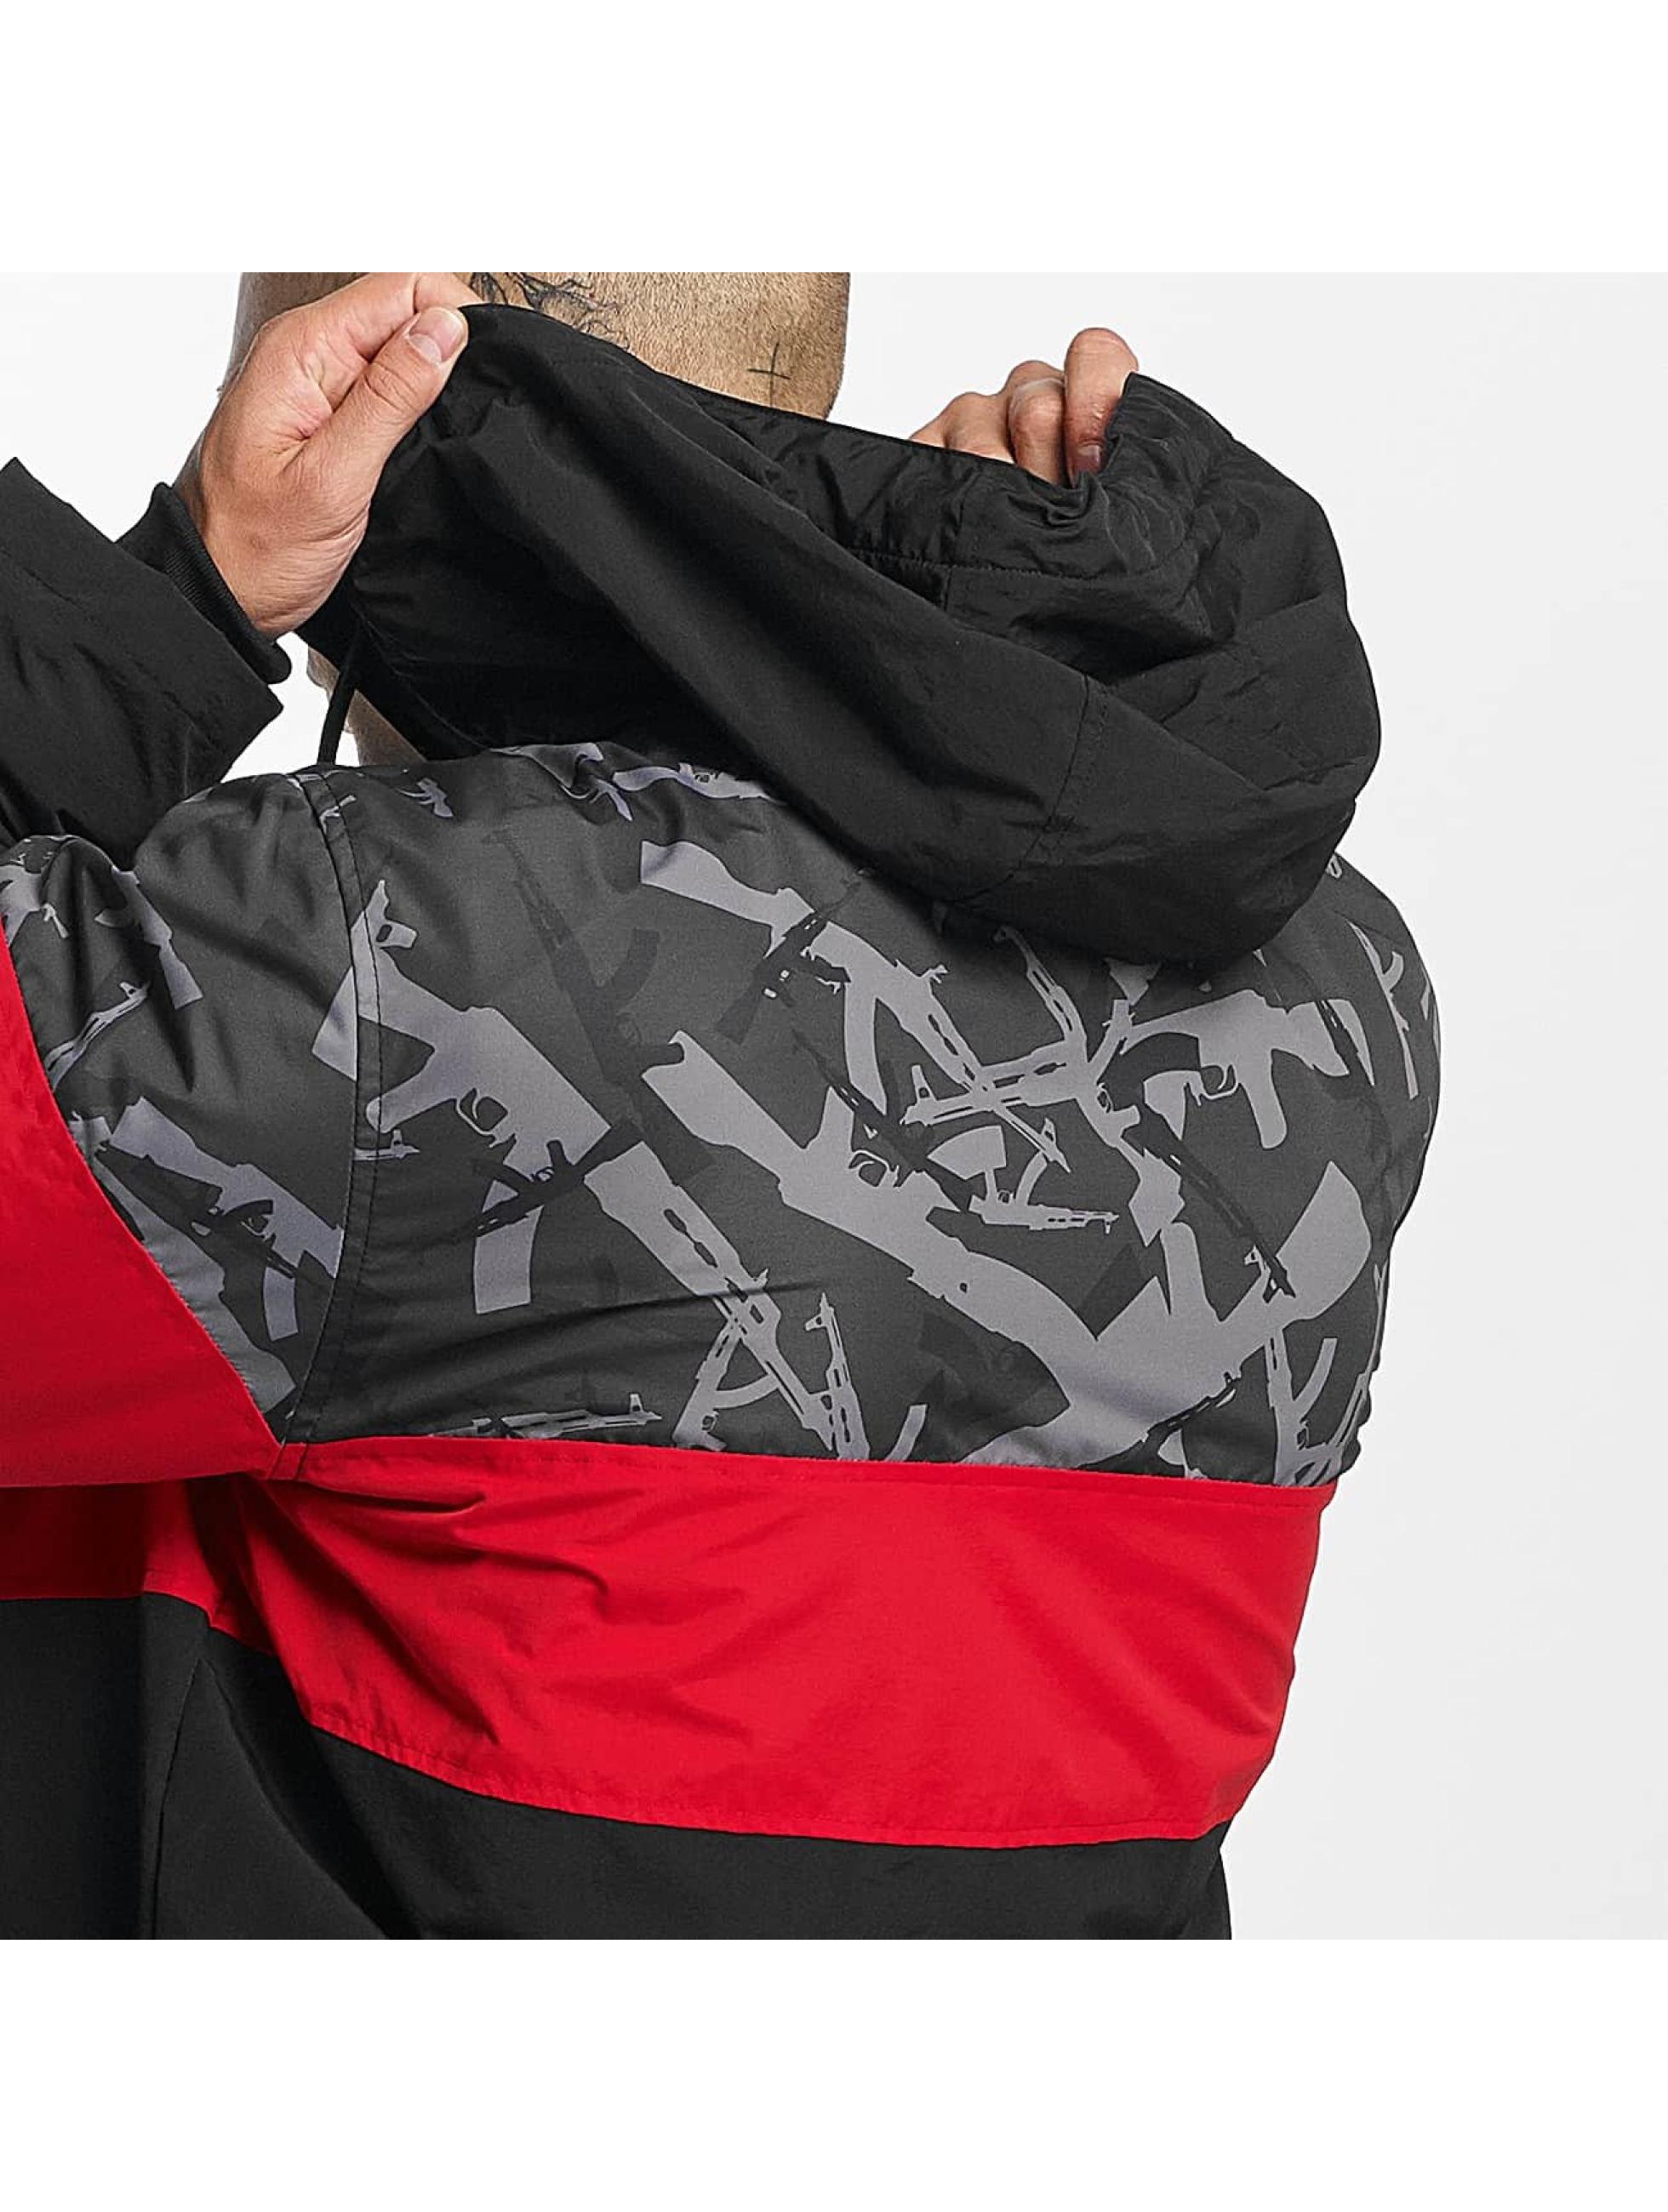 Pusher Apparel Демисезонная куртка AK Camo камуфляж